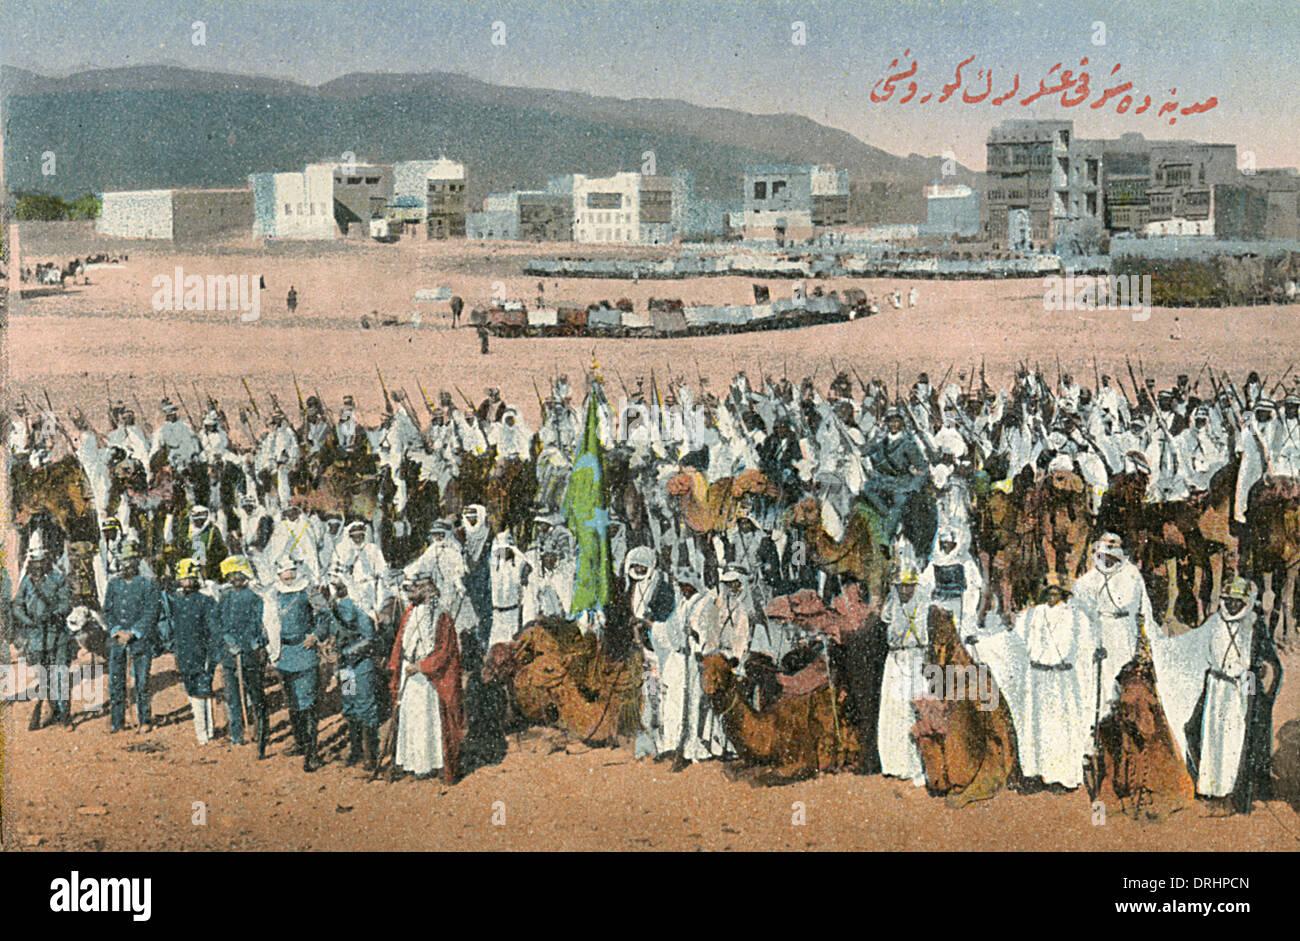 Medina, Saudi Arabia - Hajj Pilgrimage - Sacred Carpet - Stock Image